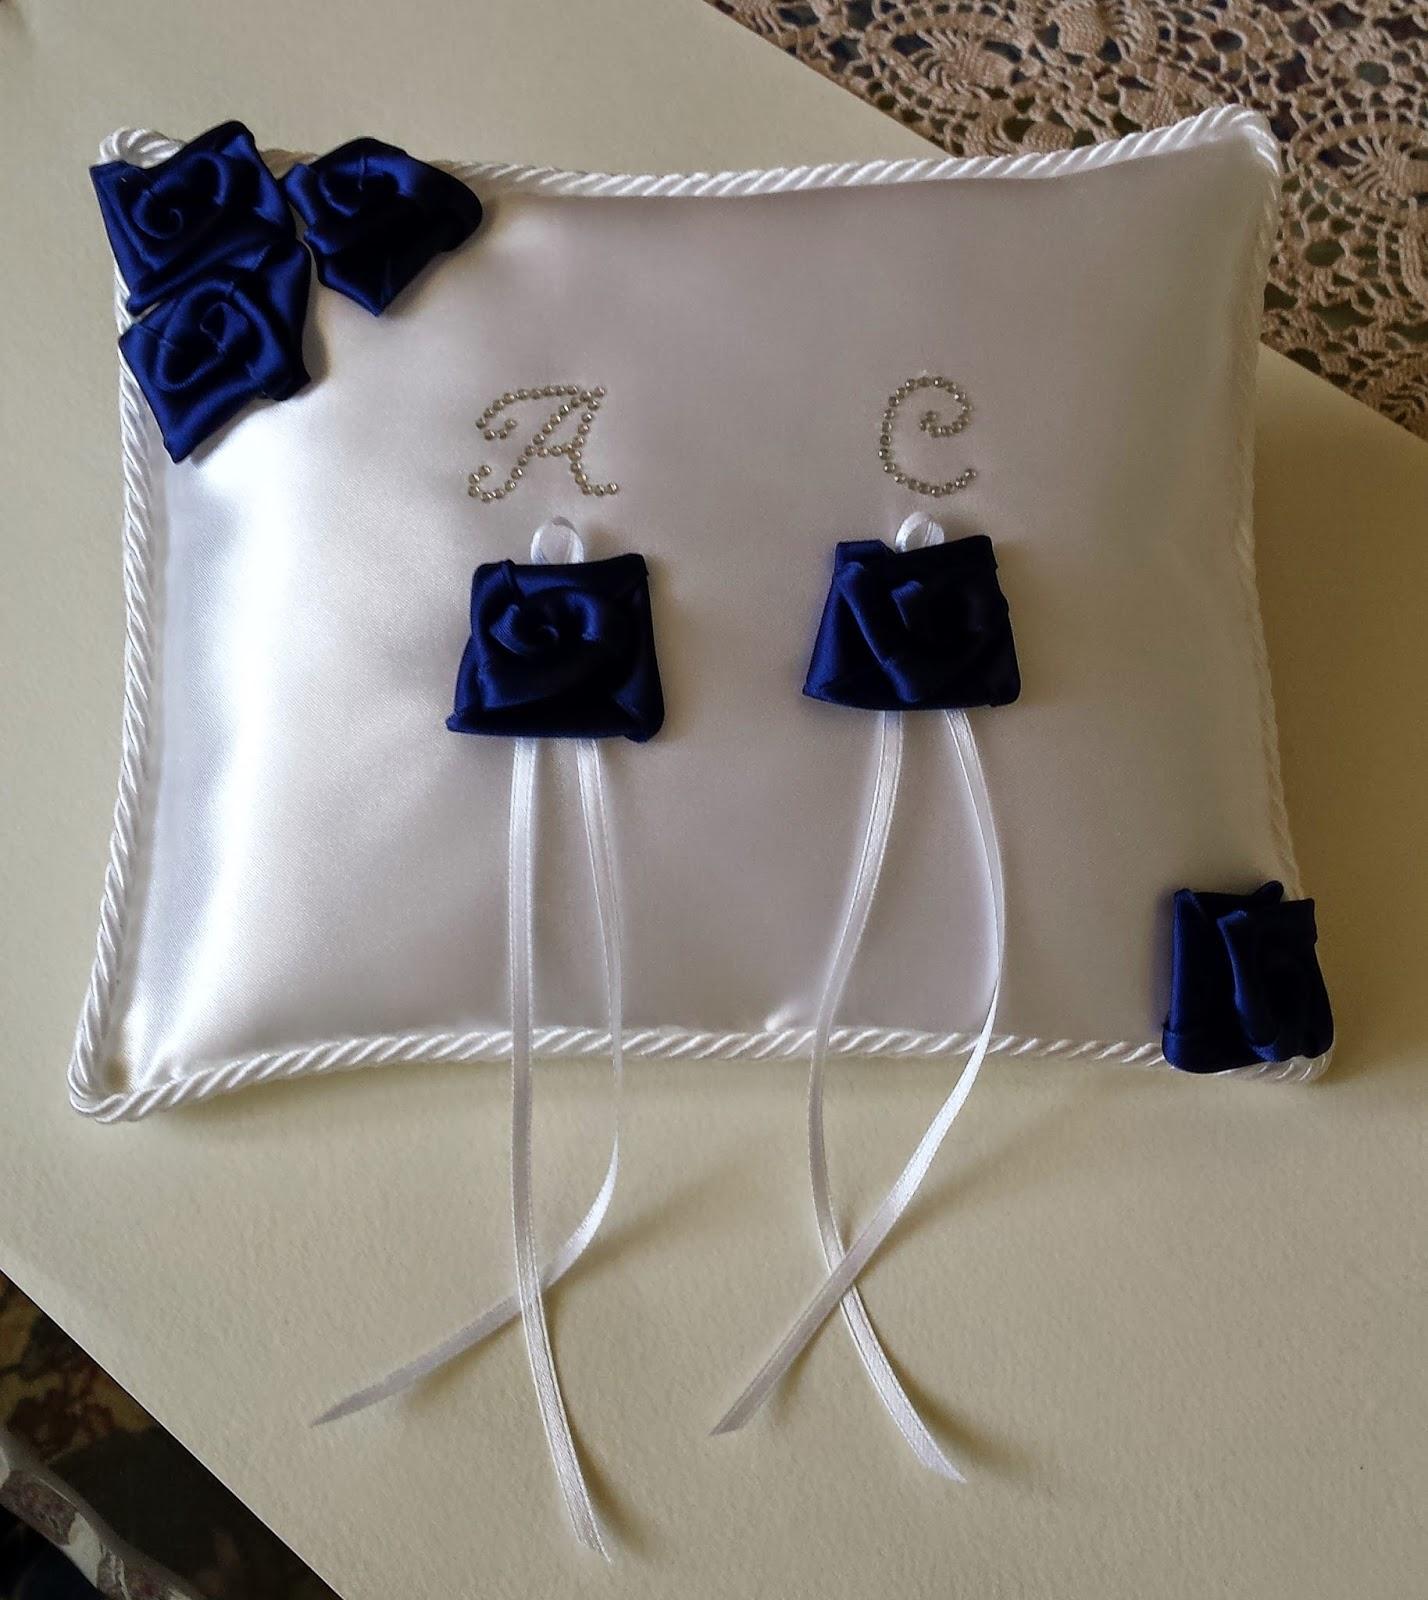 Cuscino Portafedi Bianco E Blu.Eventidecor Cuscino Portafedi In Bianco E Blu E Iniziali Strass